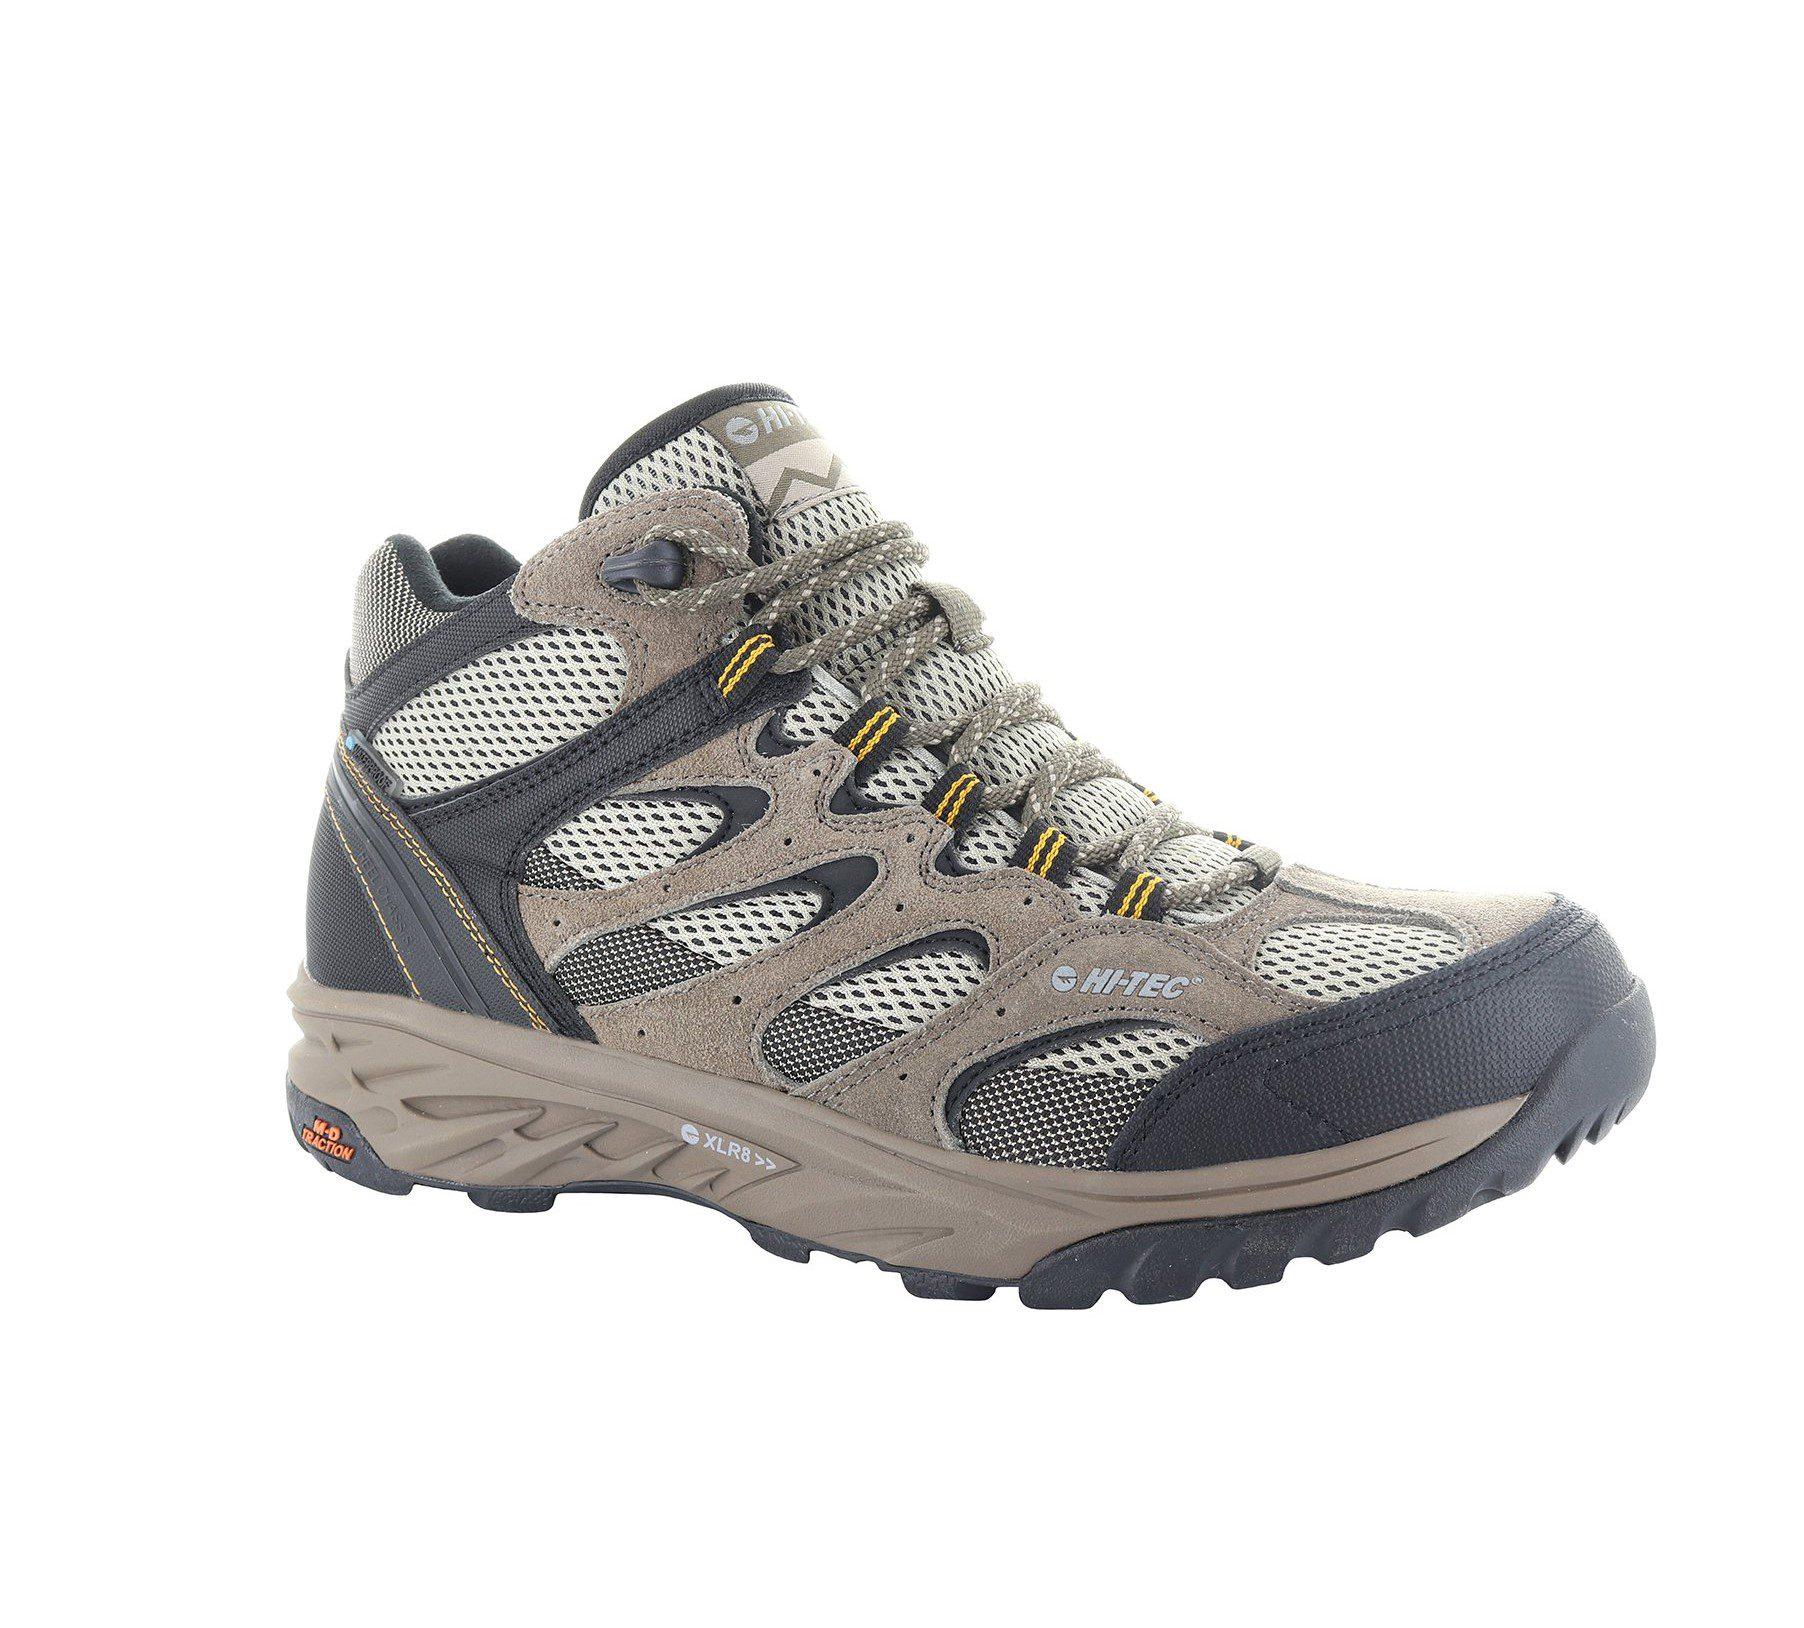 Hi-Tec Men's Wild-Fire Mid boots - Taupe / Dune / Core Gold